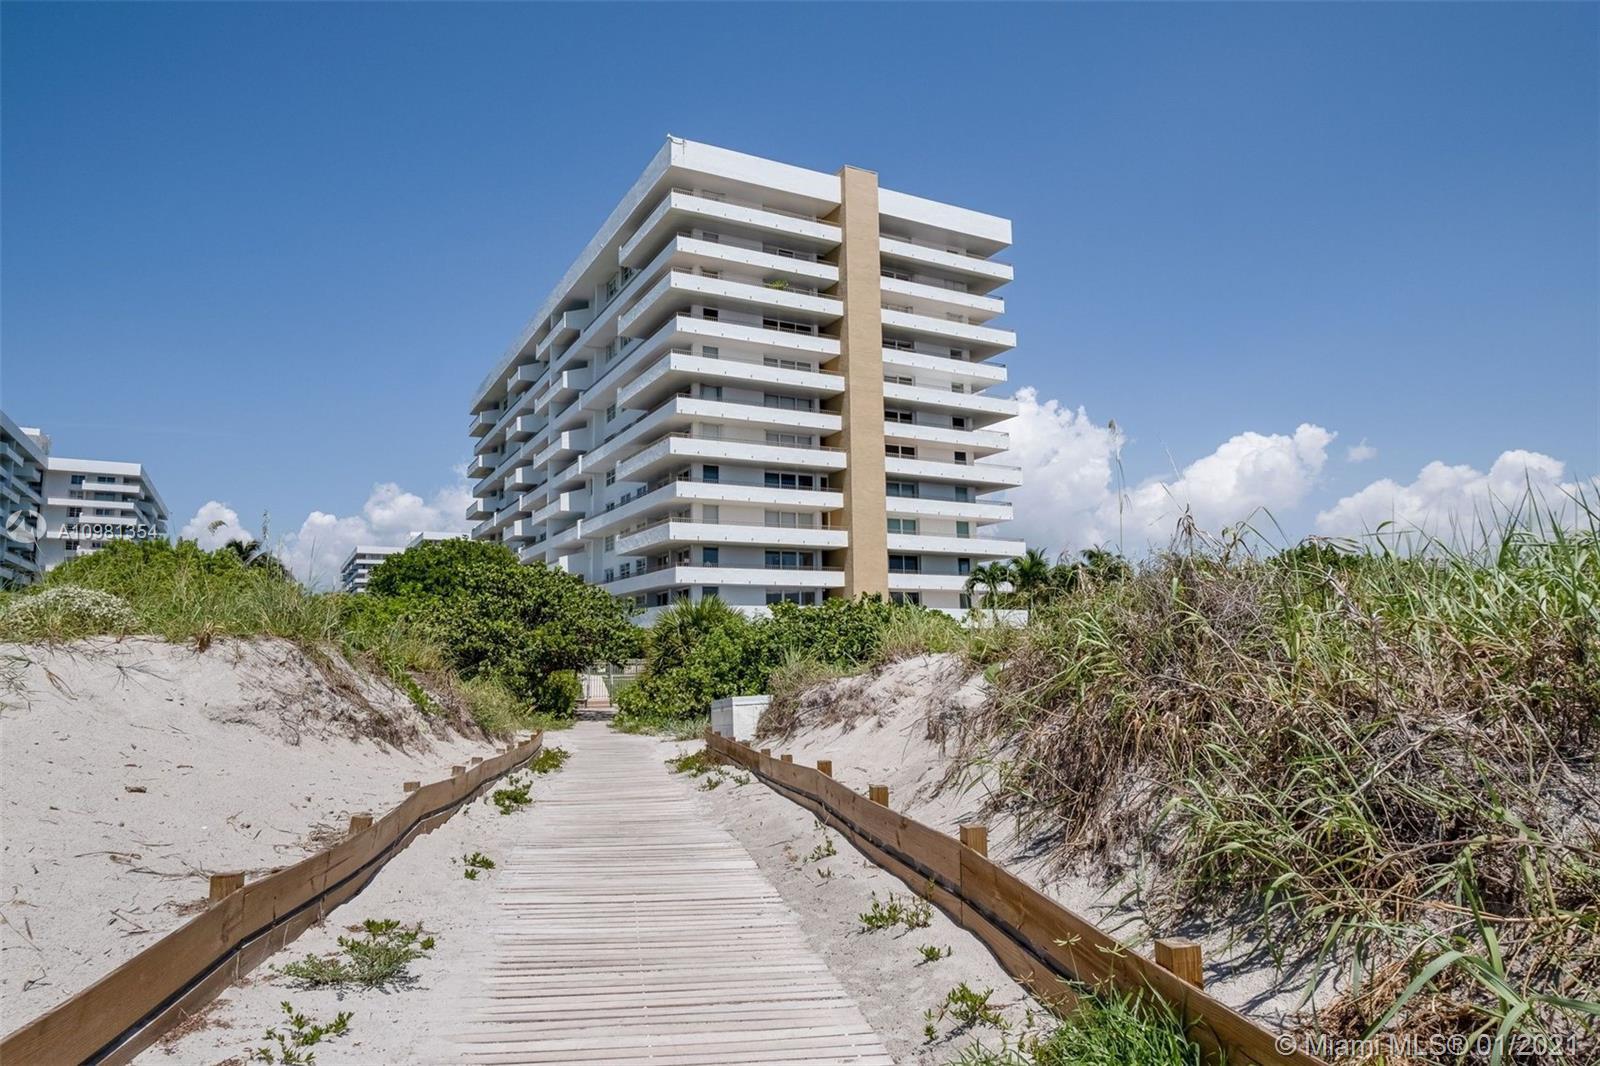 Commodore Club East #102 - 177 Ocean Lane Dr #102, Key Biscayne, FL 33149